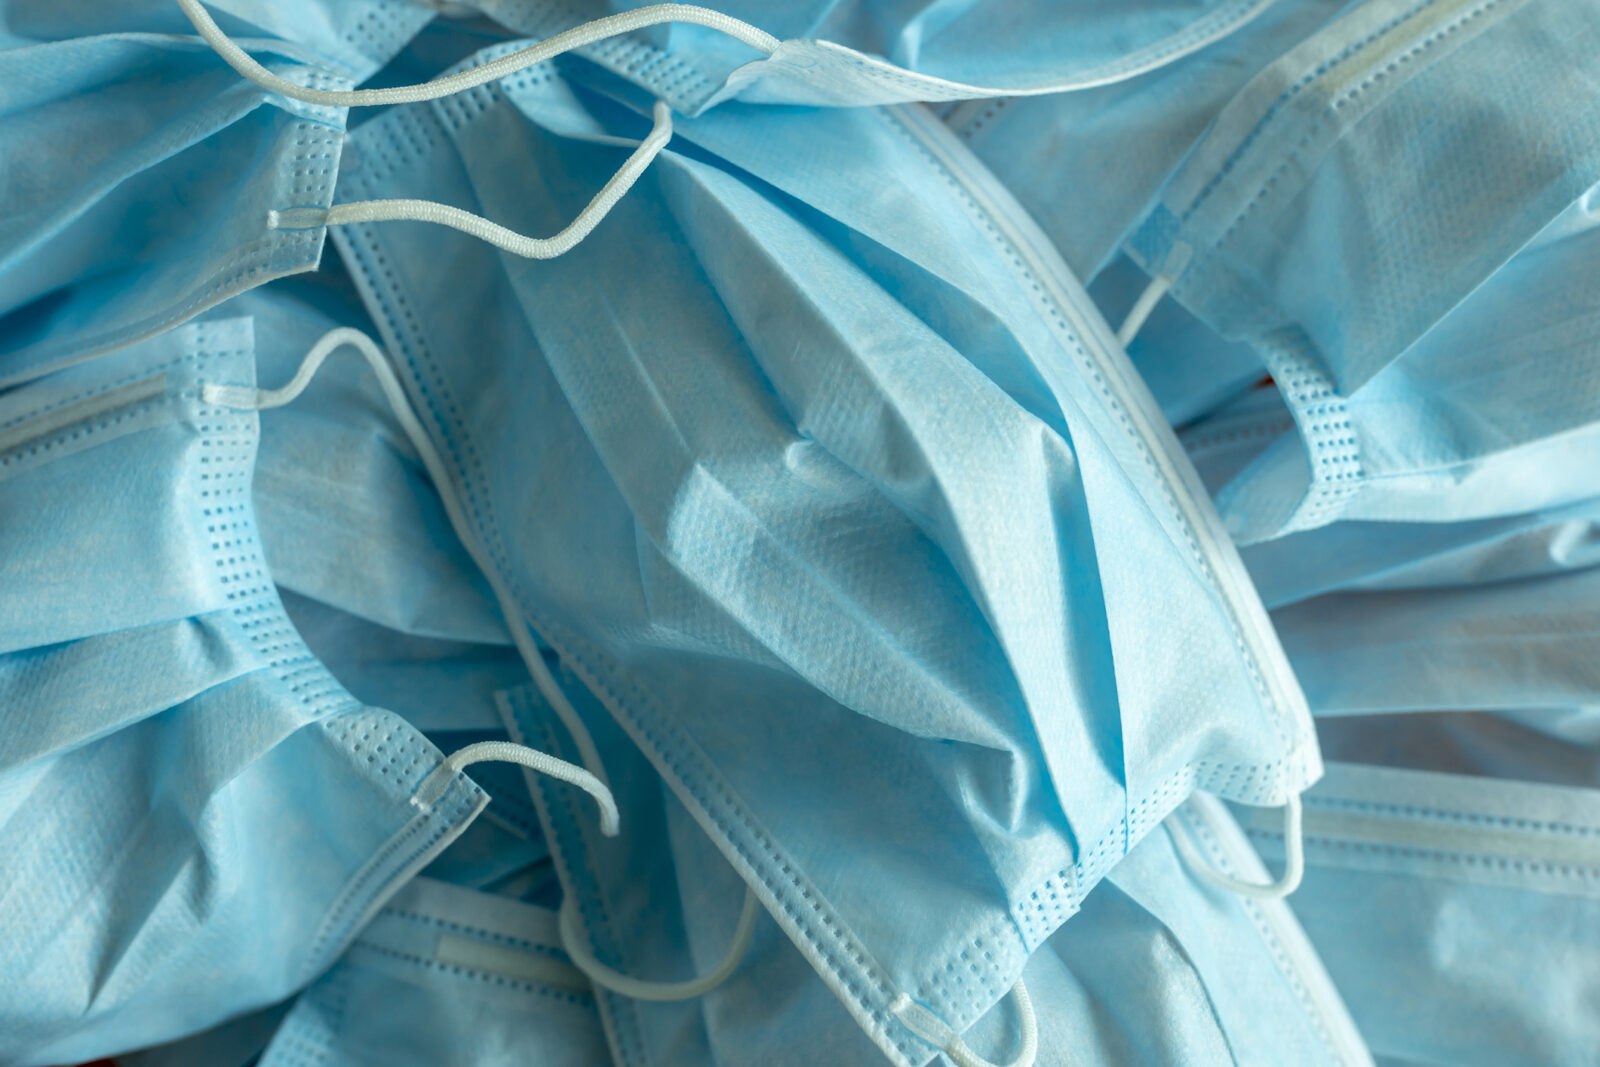 Blue Surgical Protective Masks